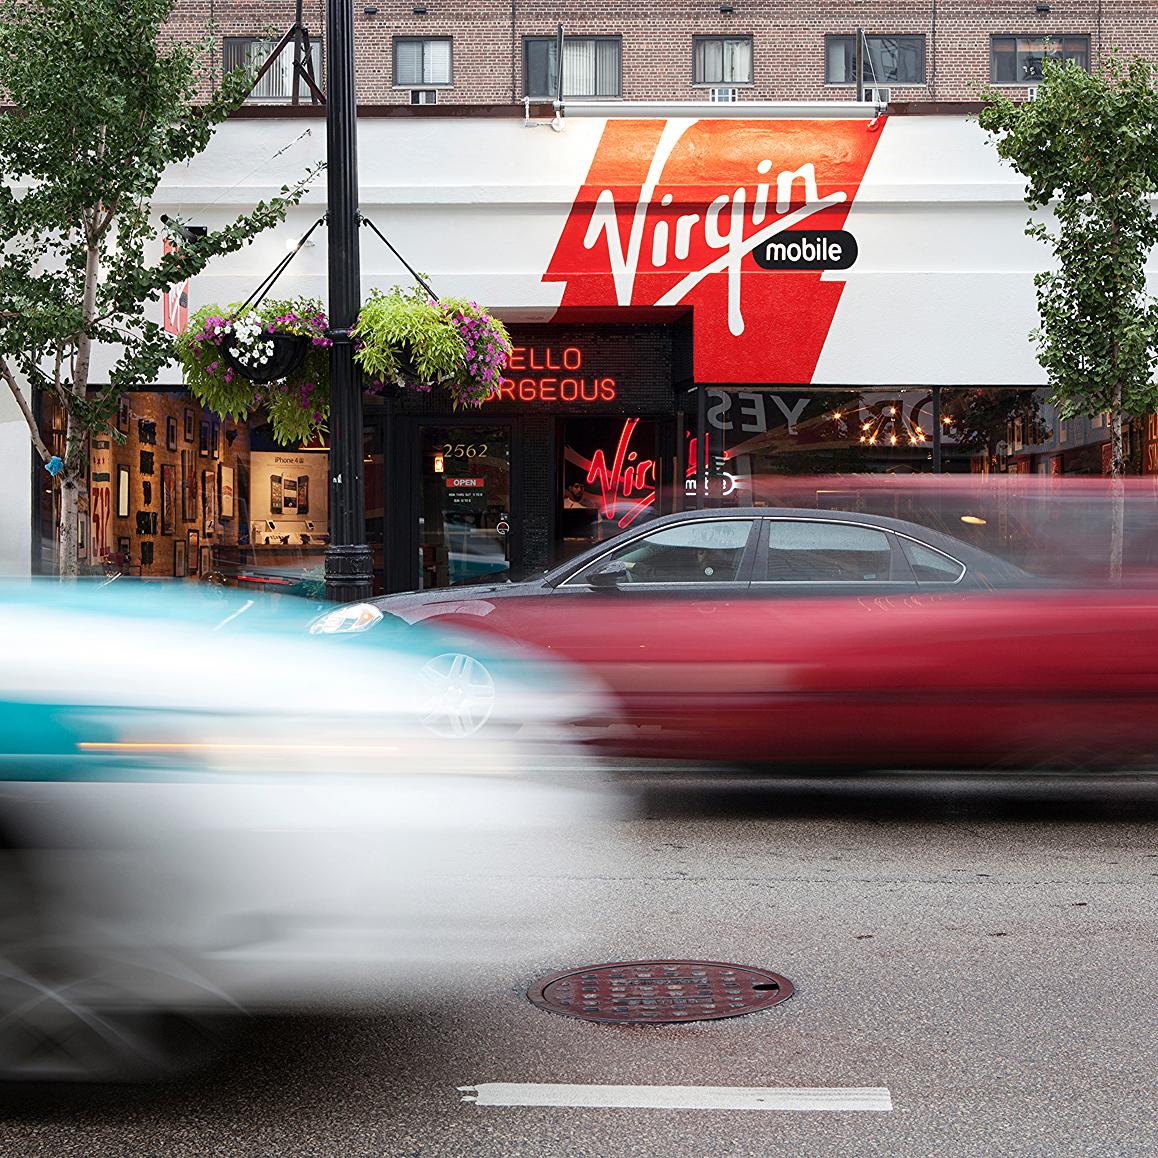 Virgin Mobile Chicago Store — Walse